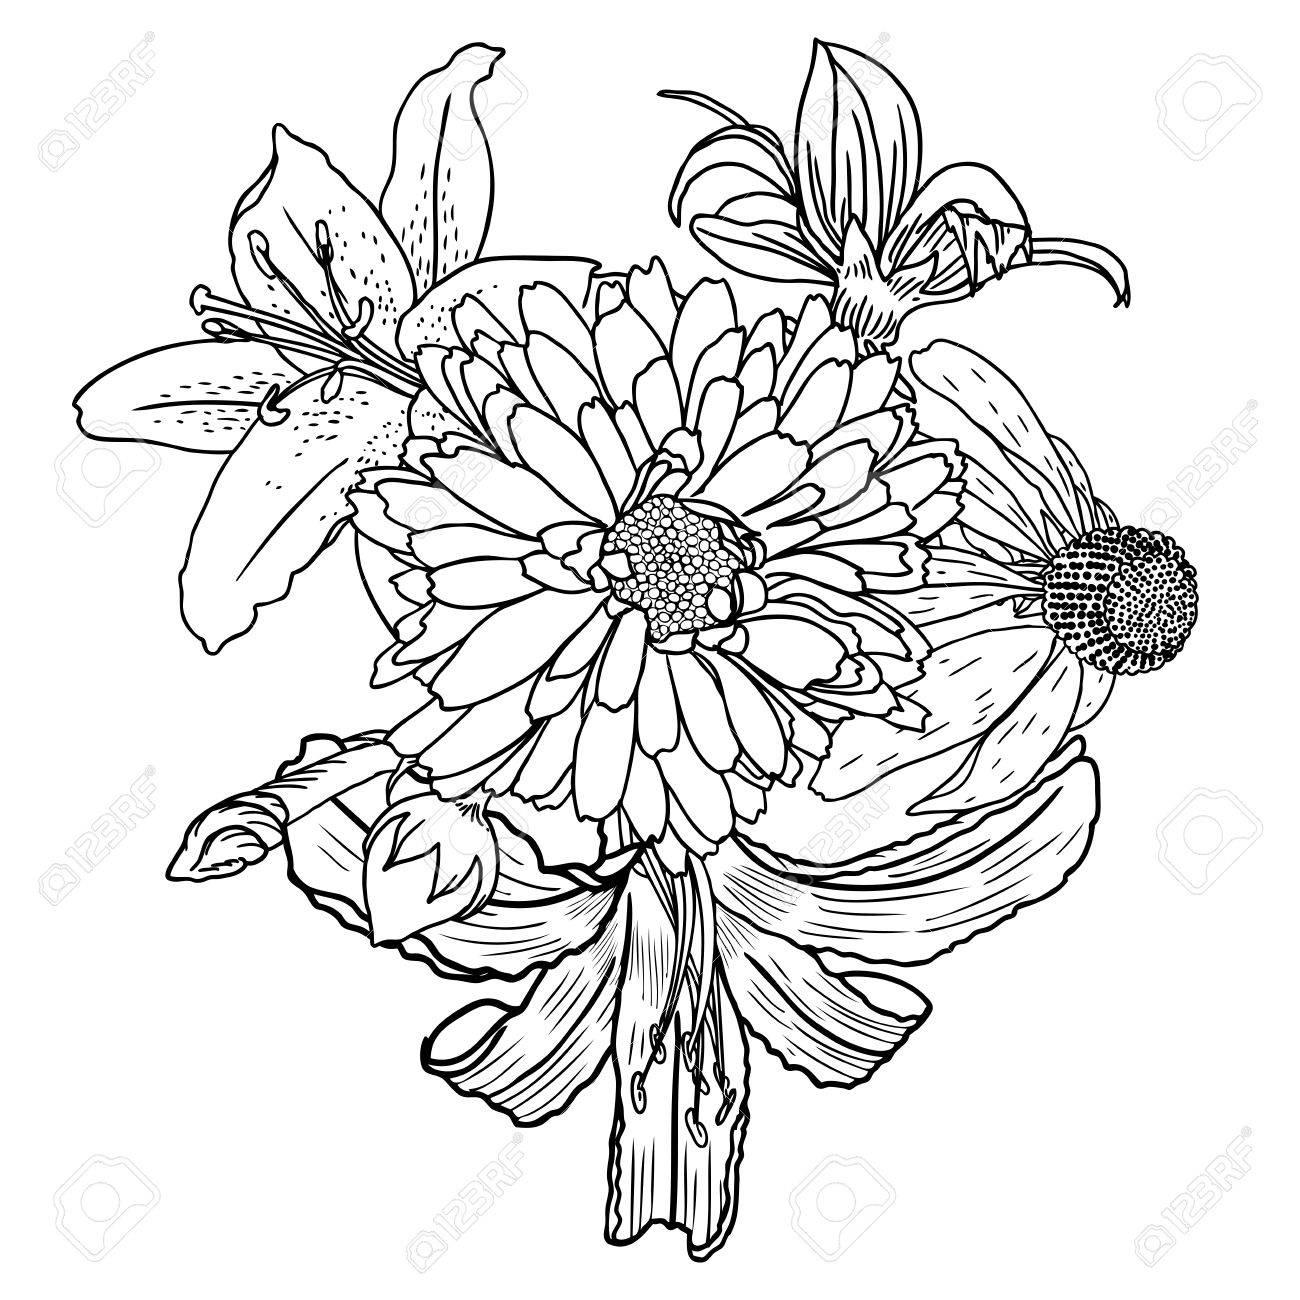 Flowers bouquet of different hand drawn flowers vintage black flowers bouquet of different hand drawn flowers vintage black white and isolated can mightylinksfo